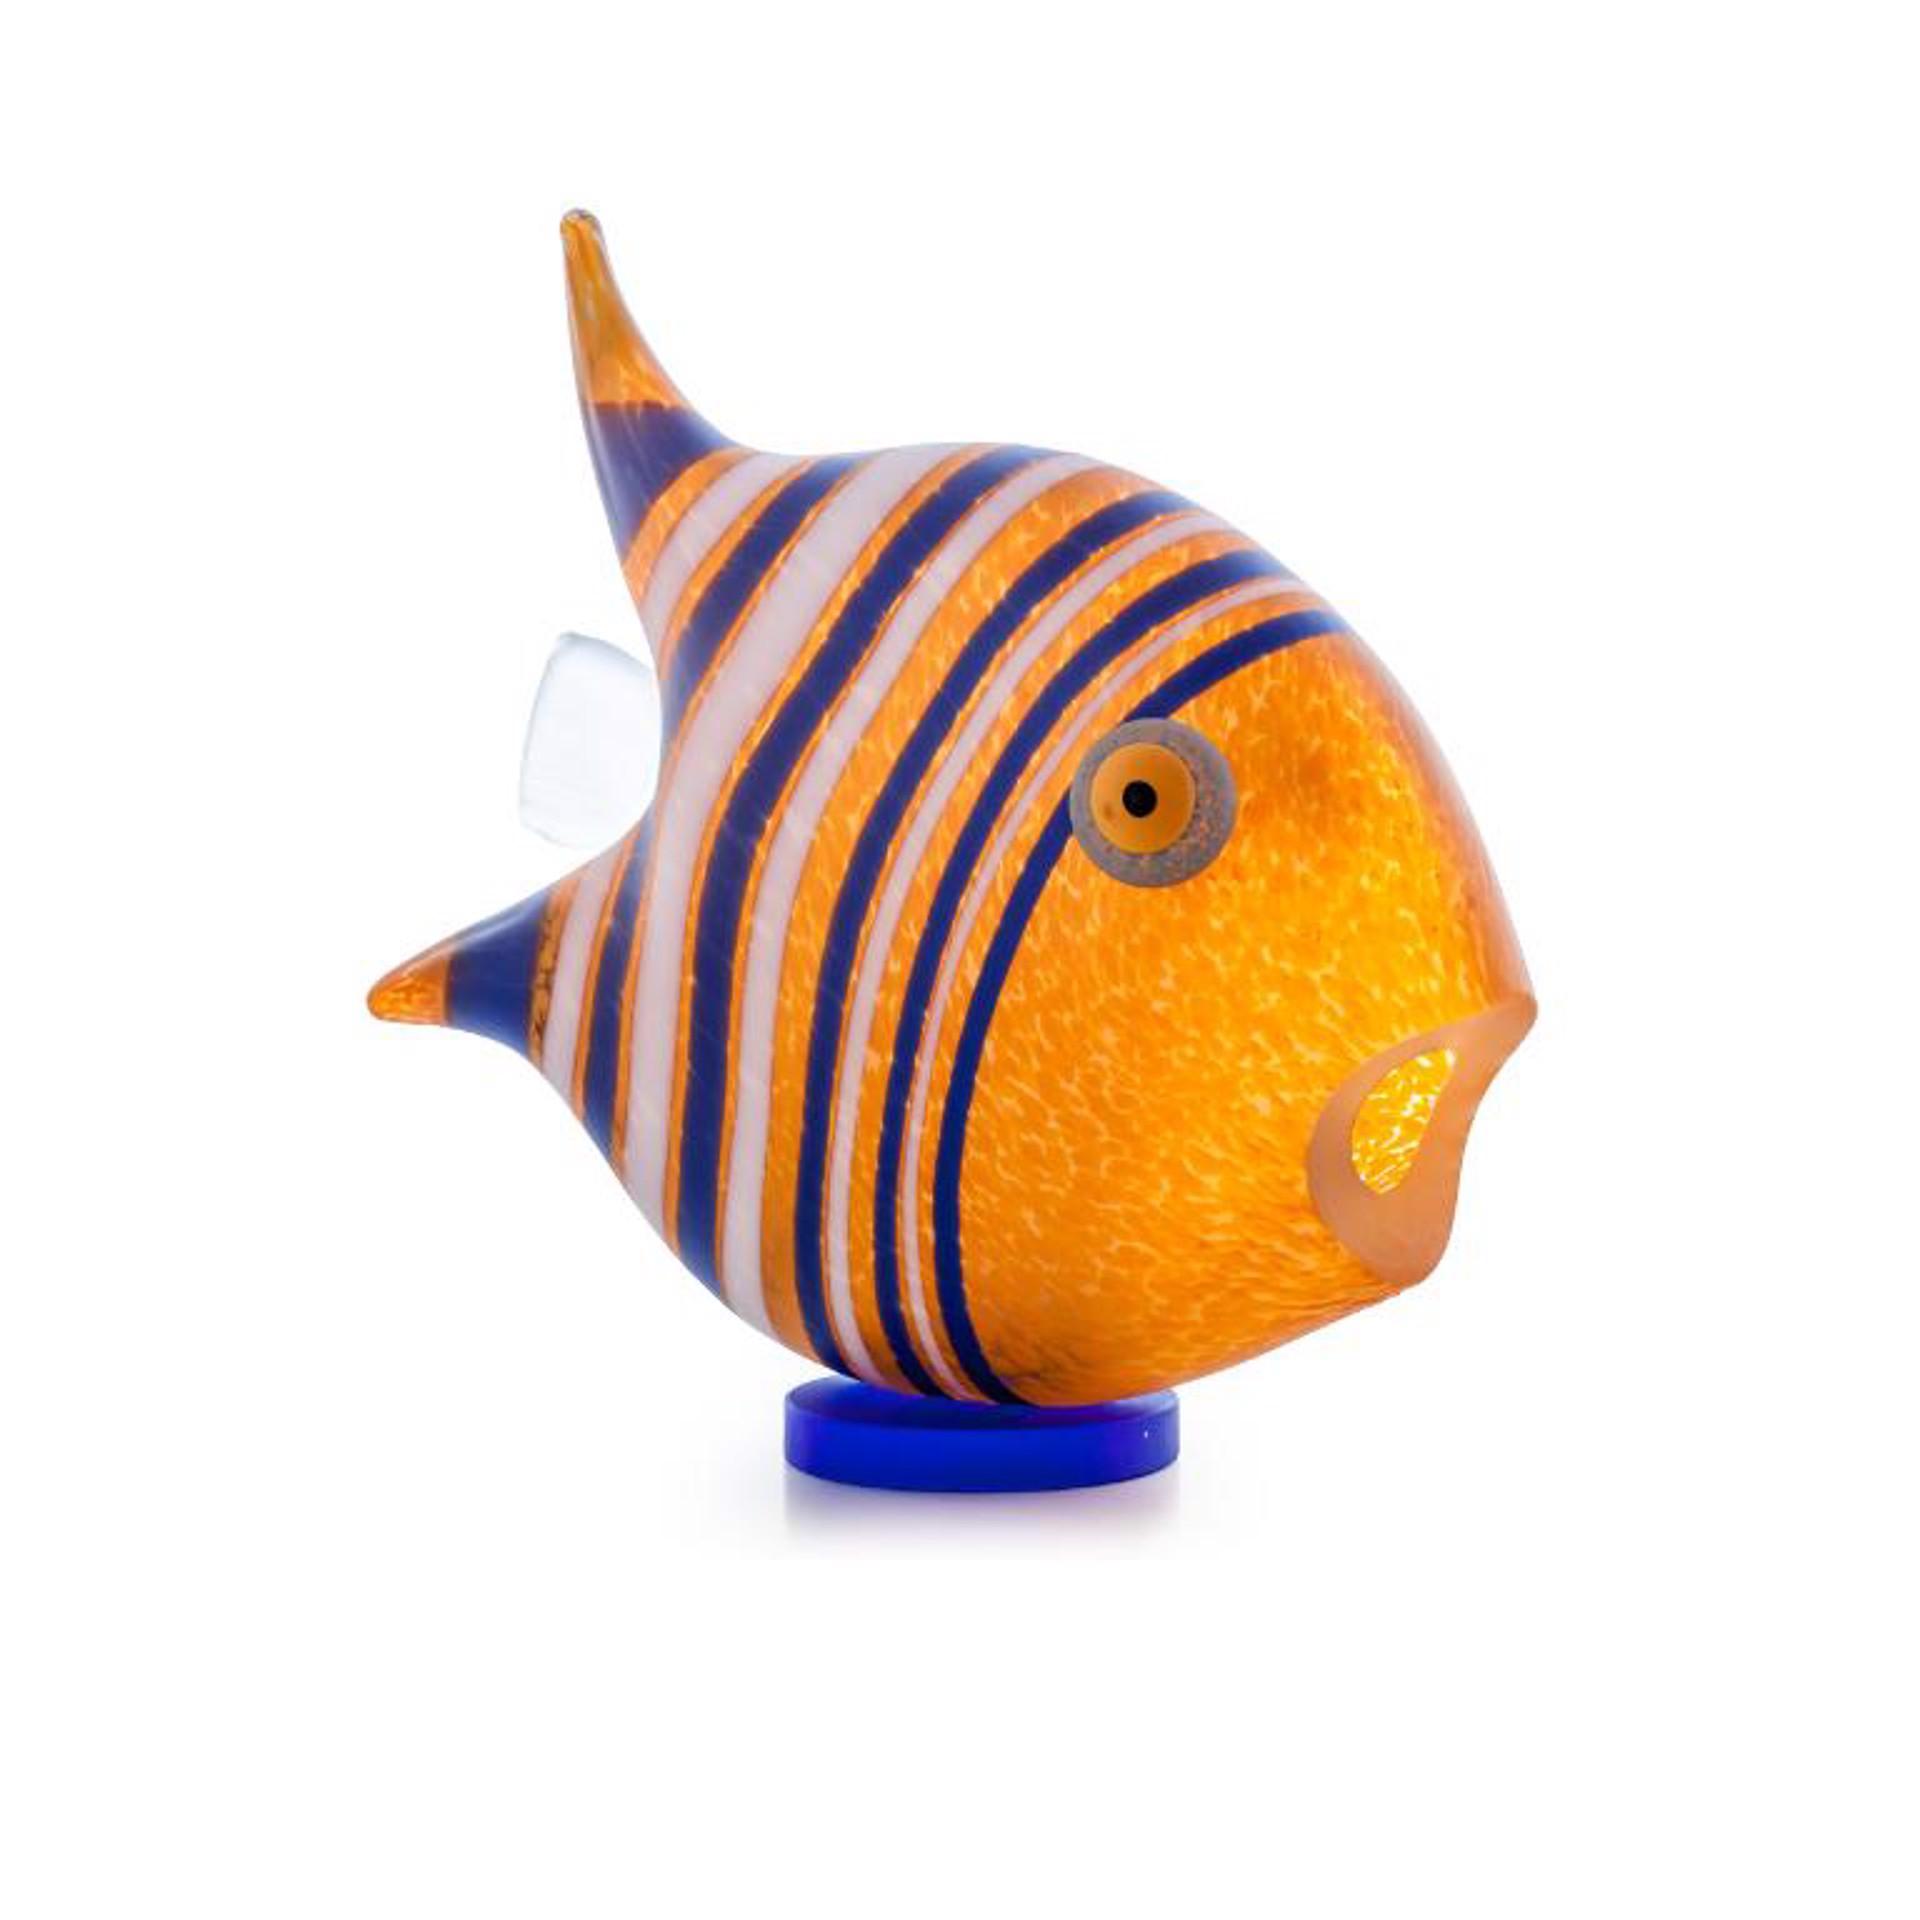 ANGEL FISH, SMALL by Borowski